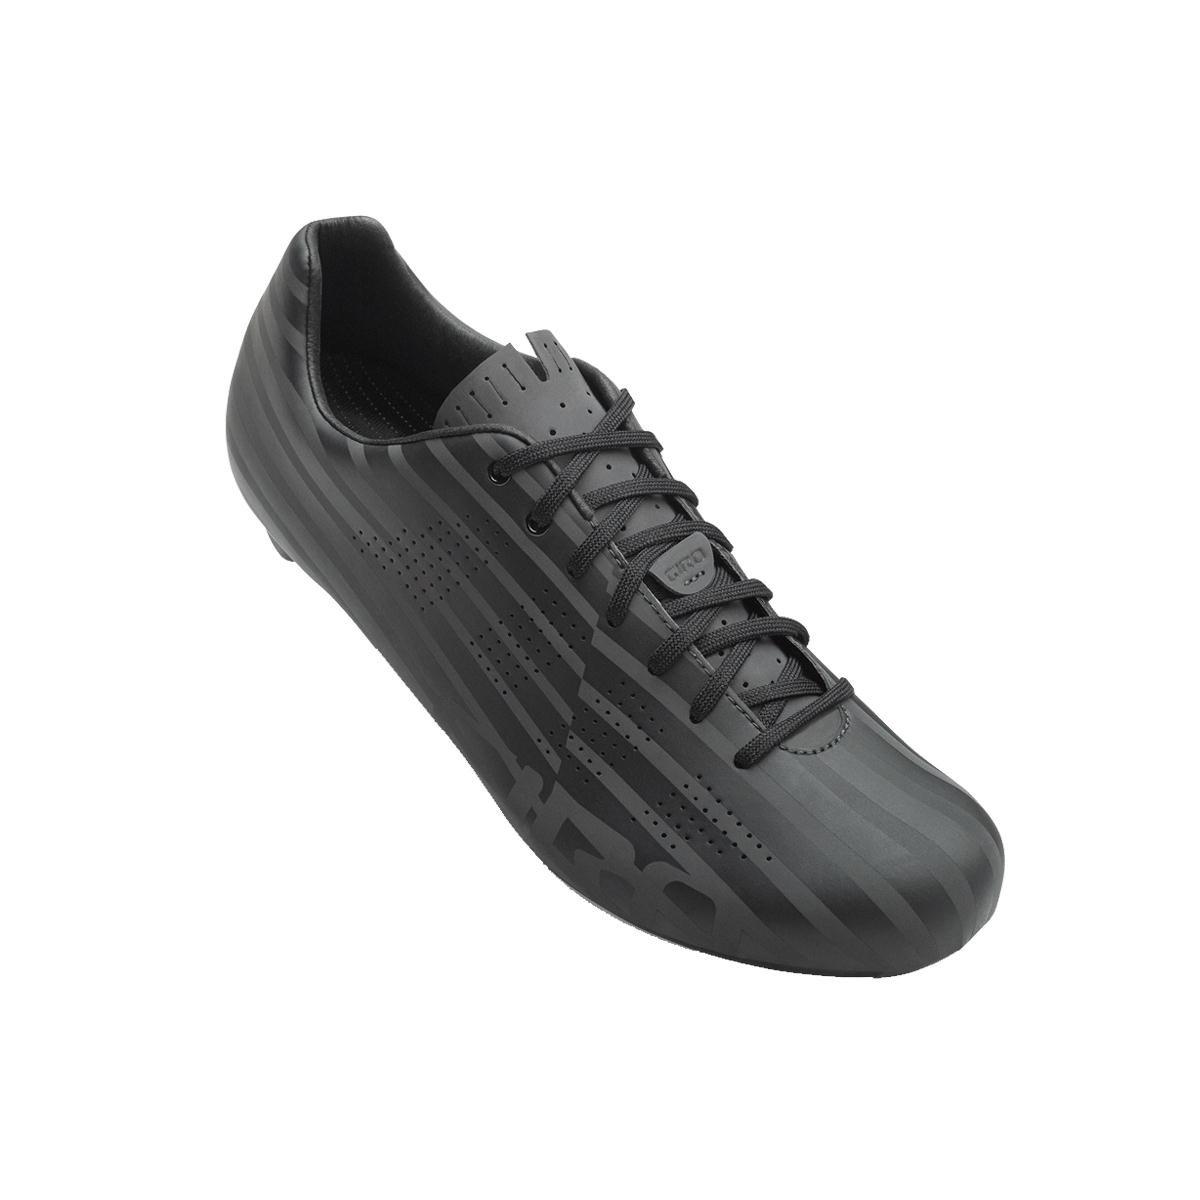 Giro Empire ACC Road Cycling Shoes B0769YVQSZ 47|Dark Shadow